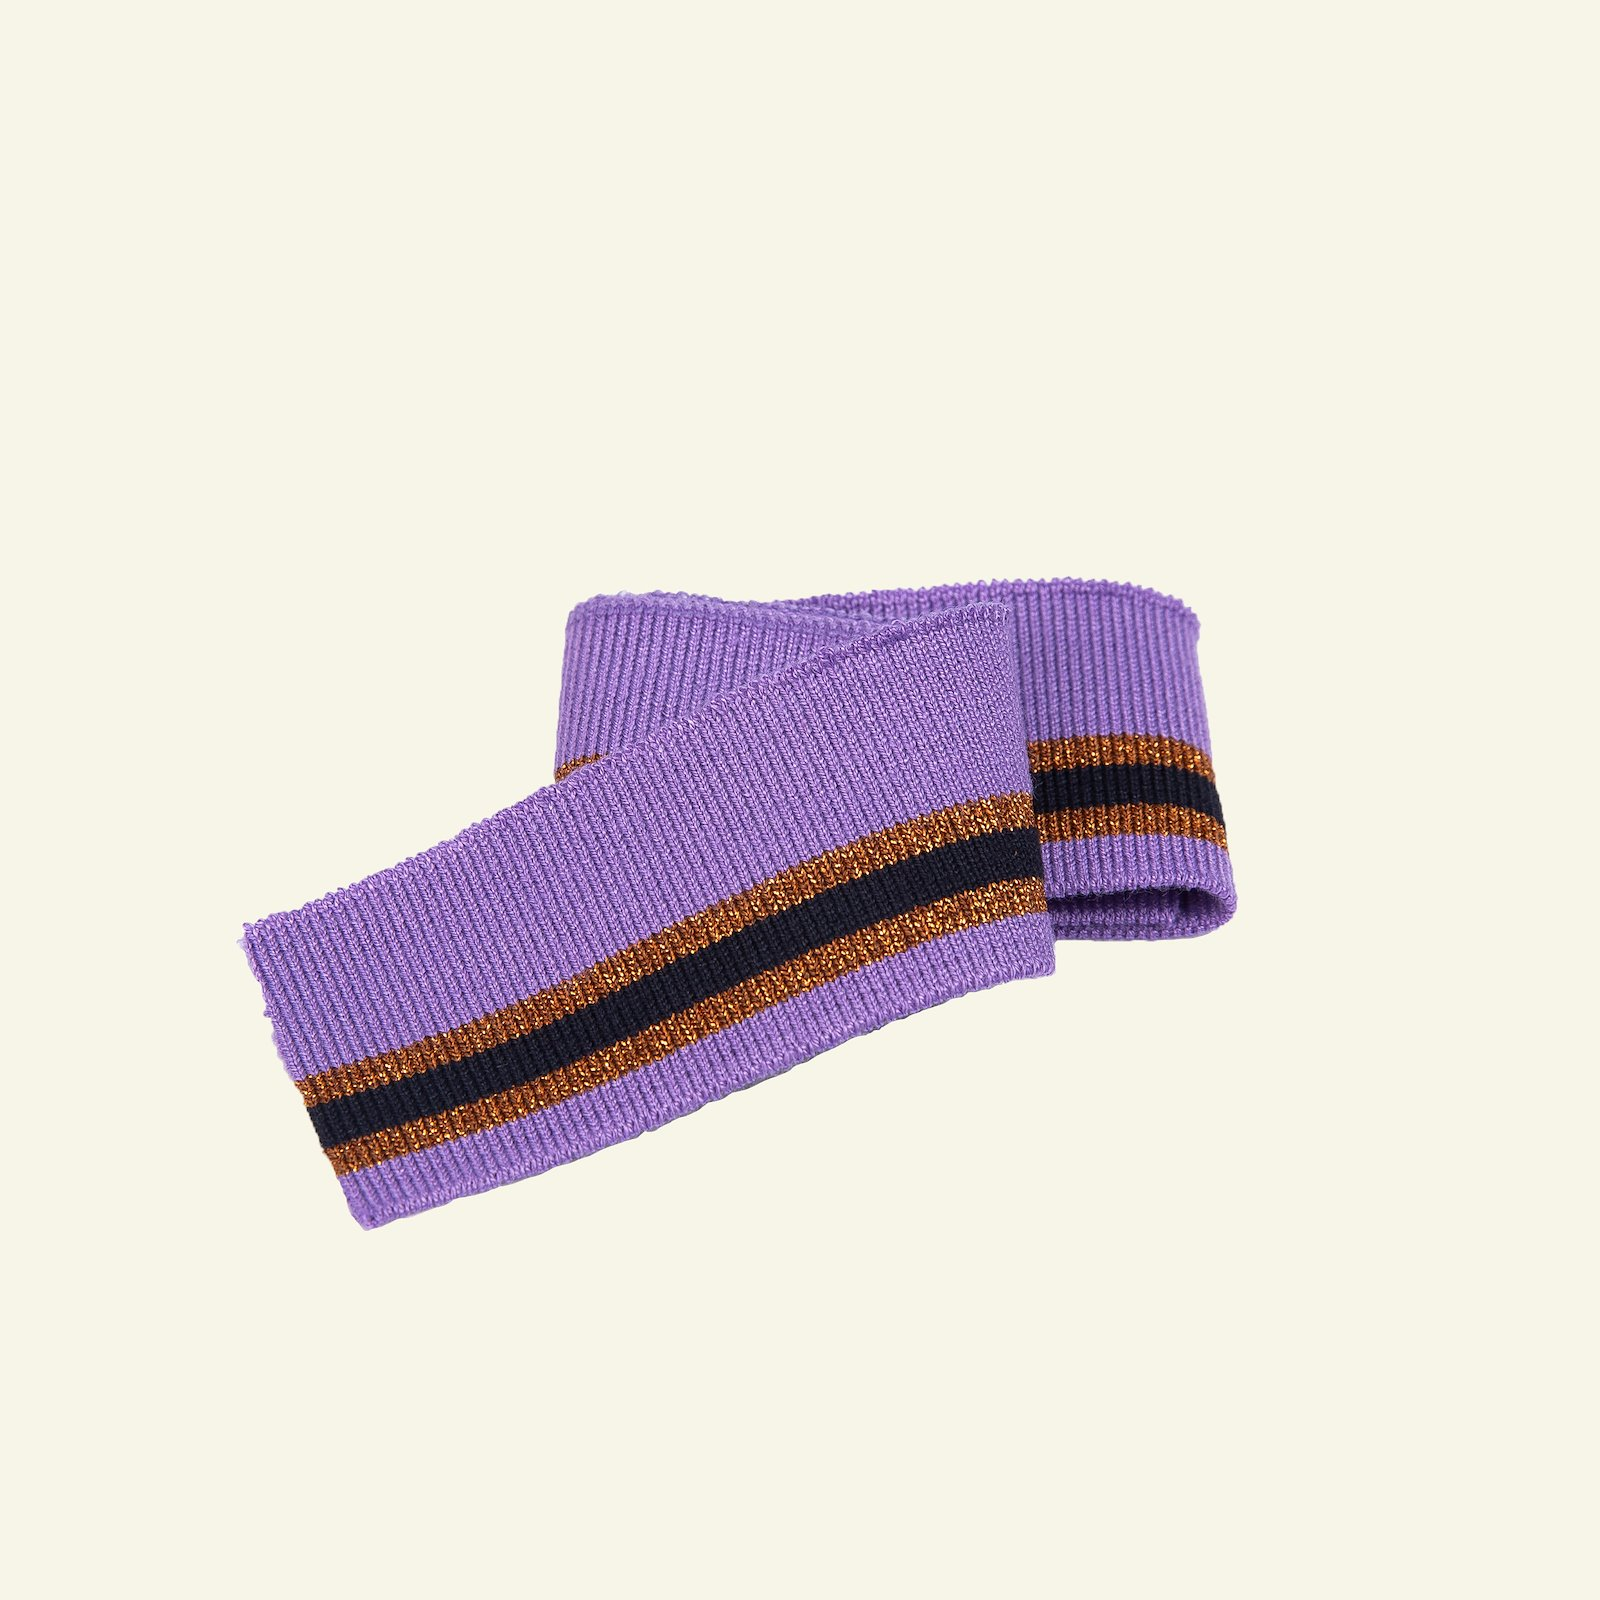 1x1 rib 3,5x100cm purple/copper/black 1p 96180_pack